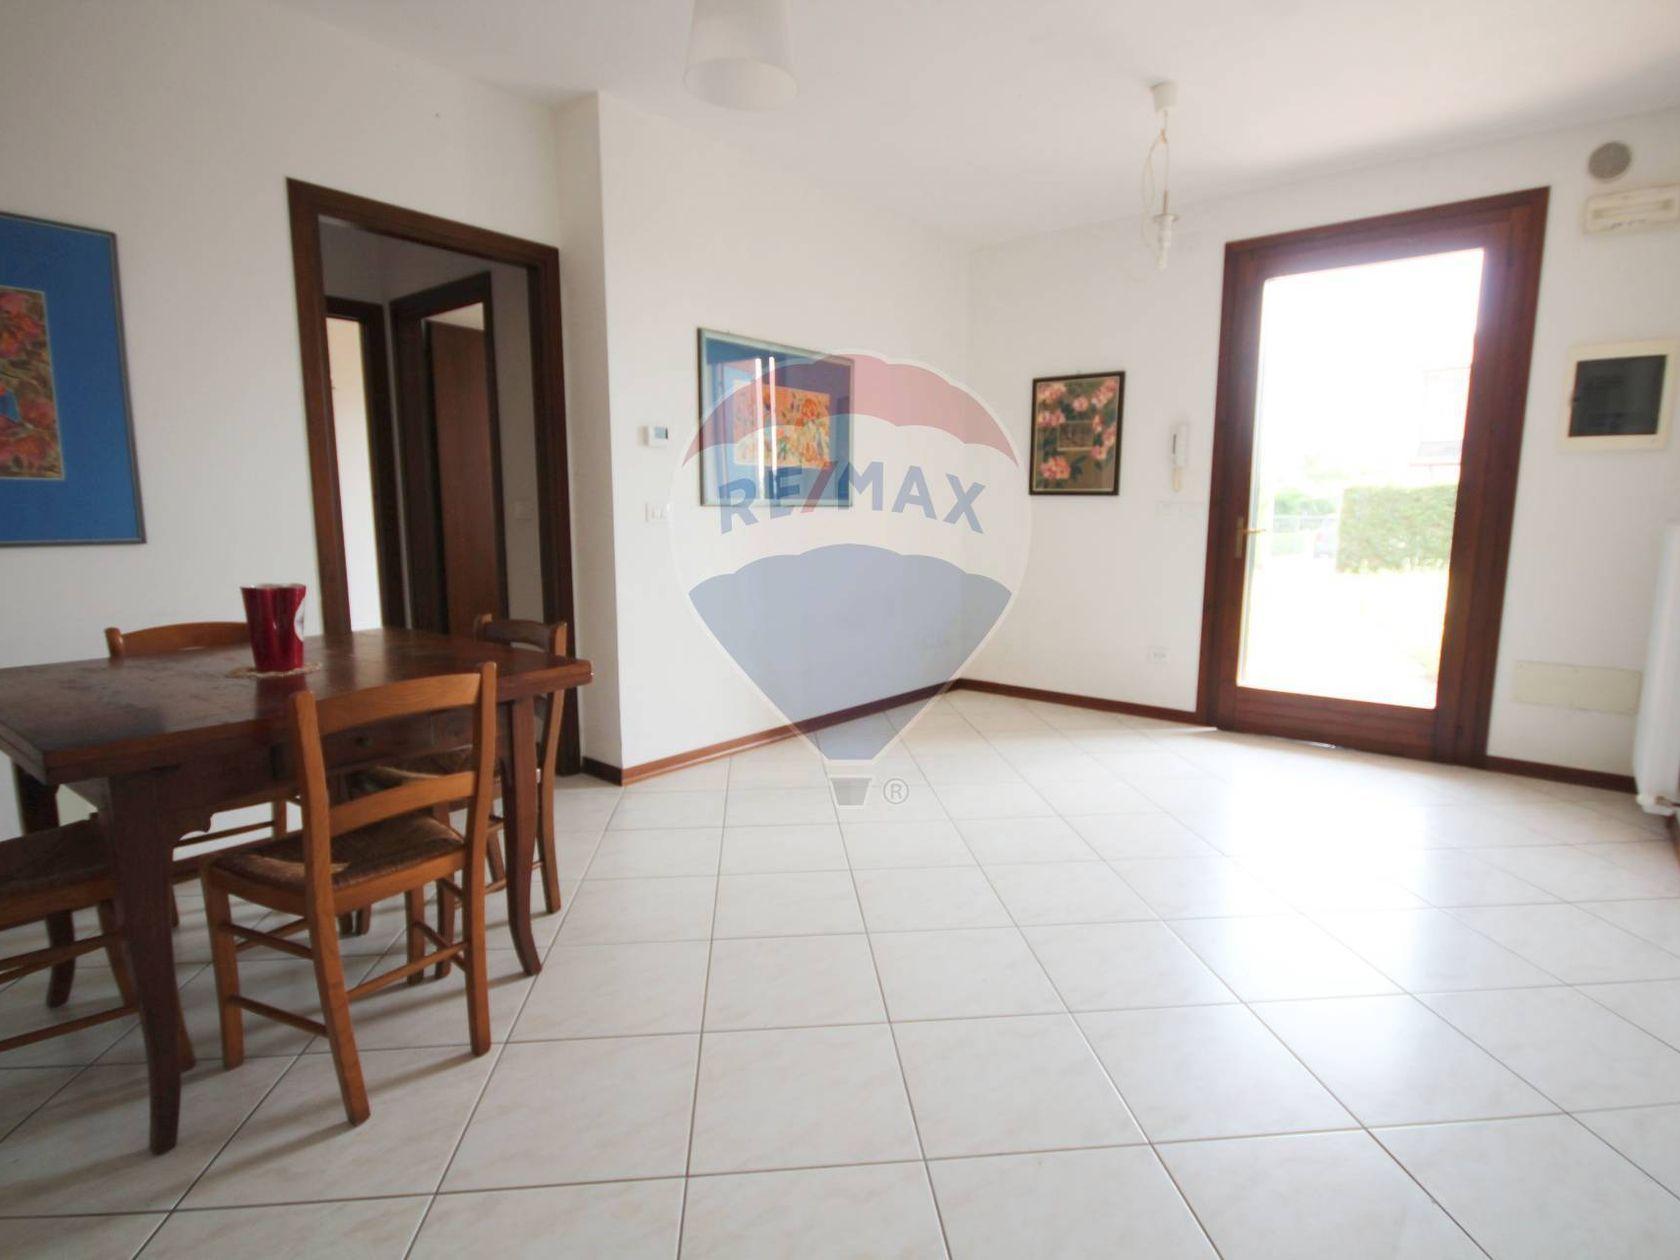 Appartamento Cantarana, Cona, VE Vendita - Foto 6